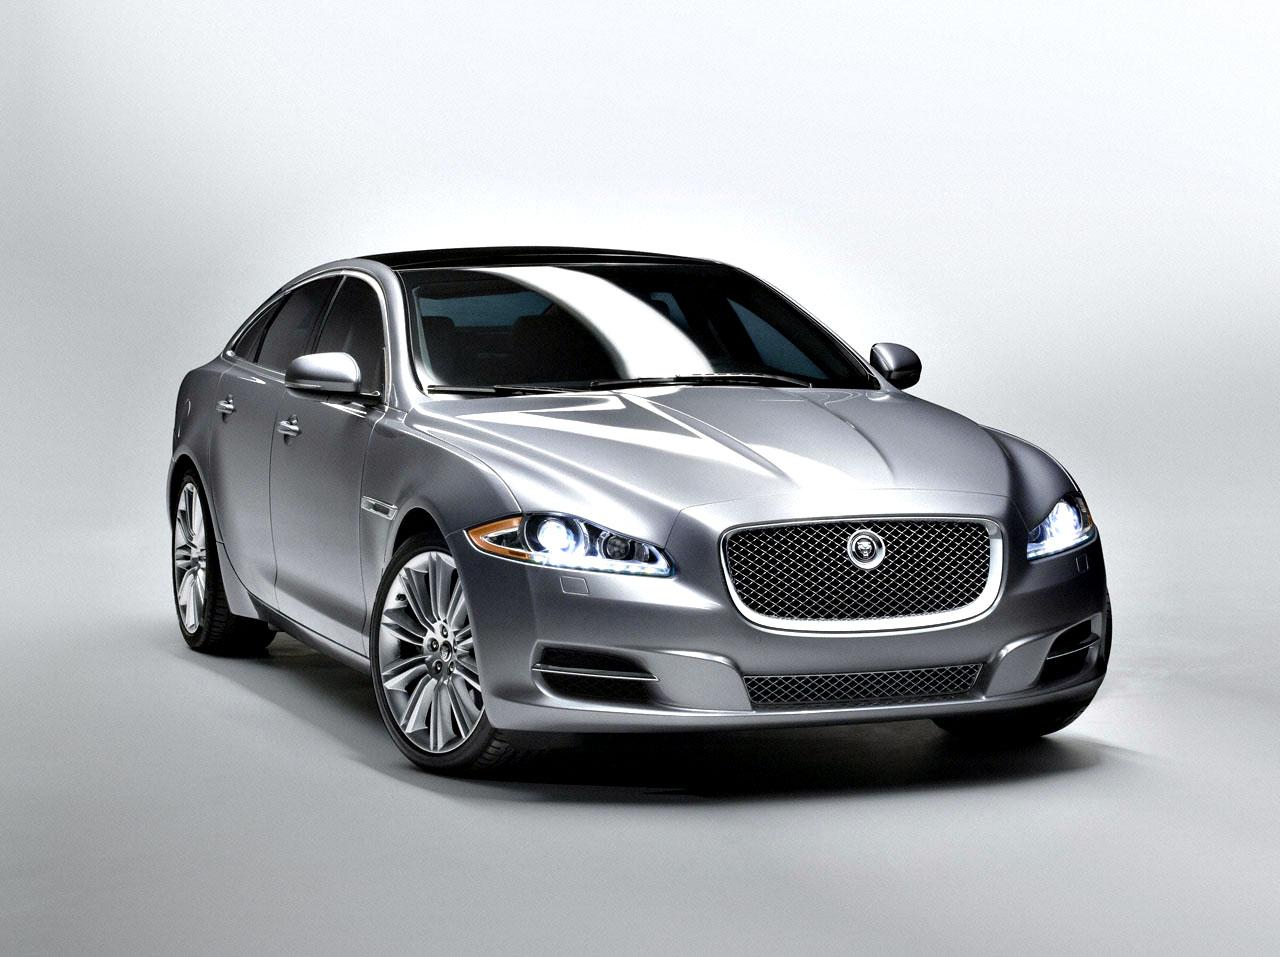 Jaguar Offering Free Scheduled Maintenance On All 2011 Models